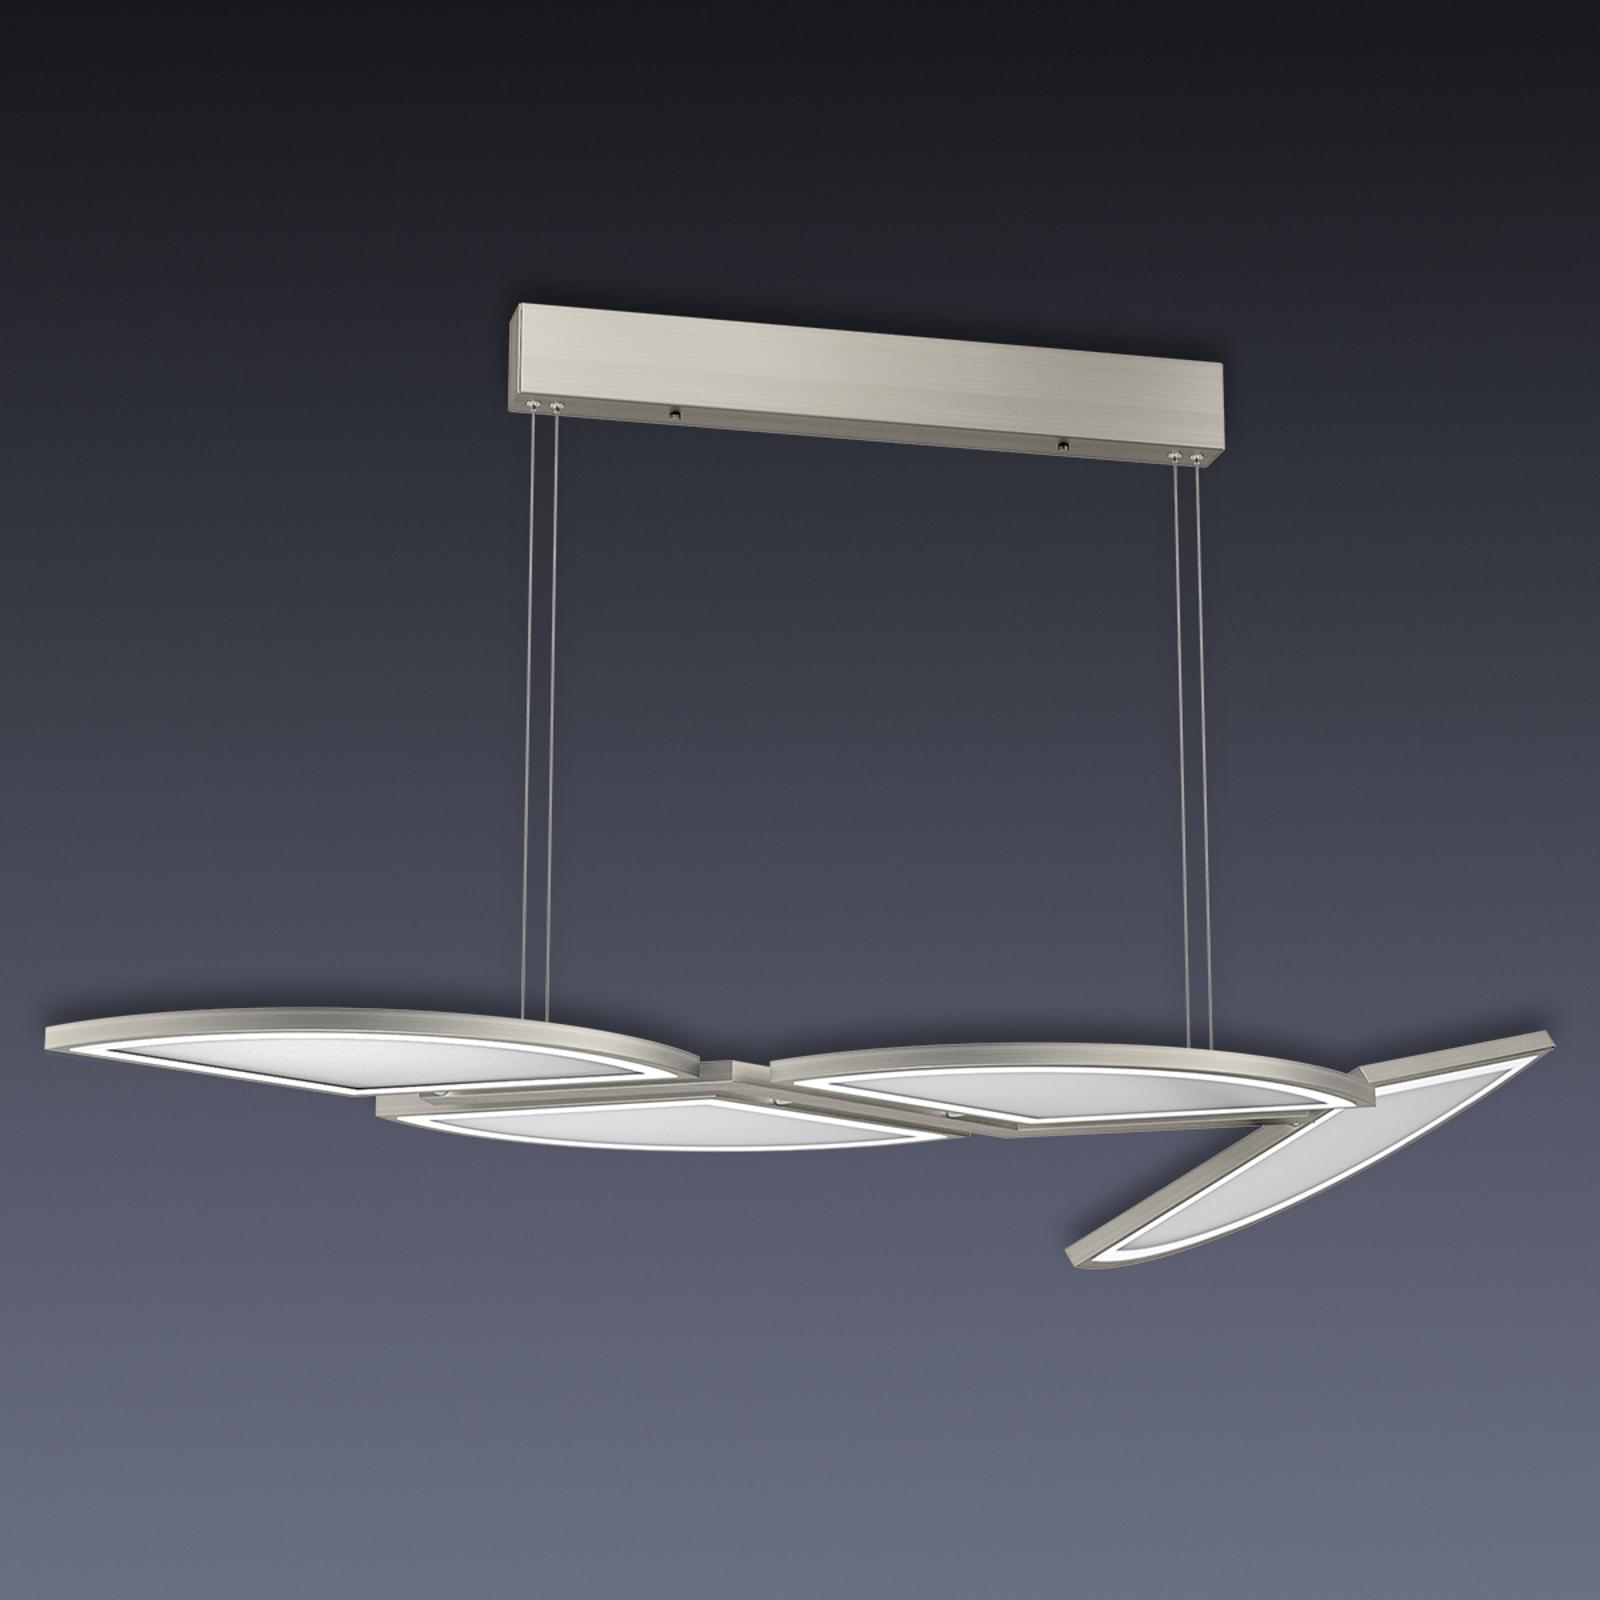 Wielopunktowa lampa wisząca LED MOVIL